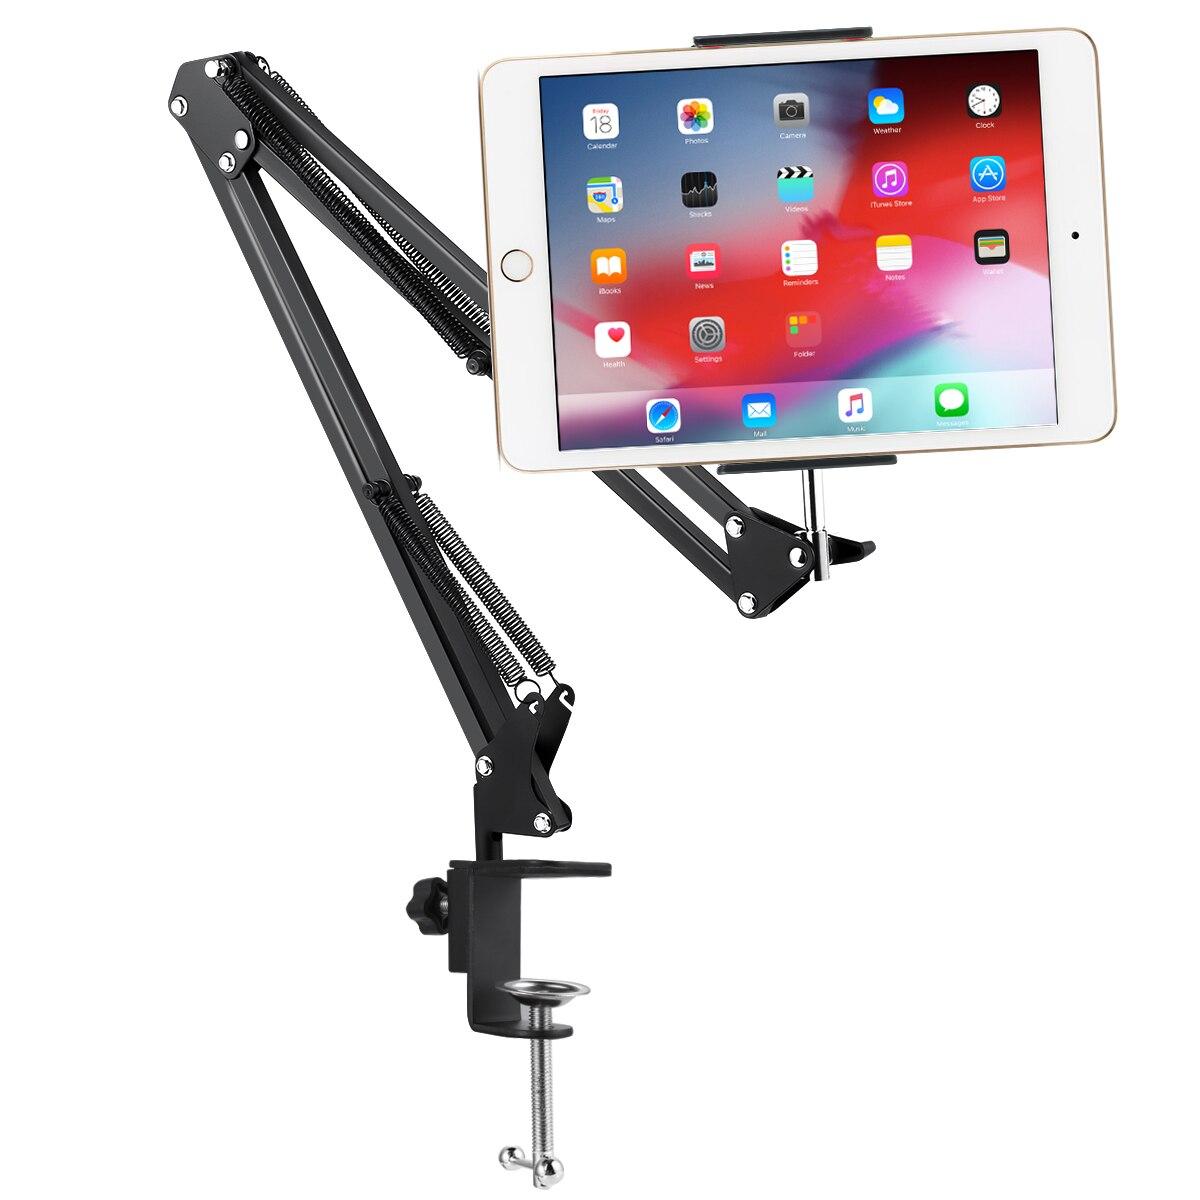 Black/White Cellphone Tablet Metal Holder Stand Adjustable Long Arms Mount Bracket for 12-18CM Wide Mobile Phone Tablets